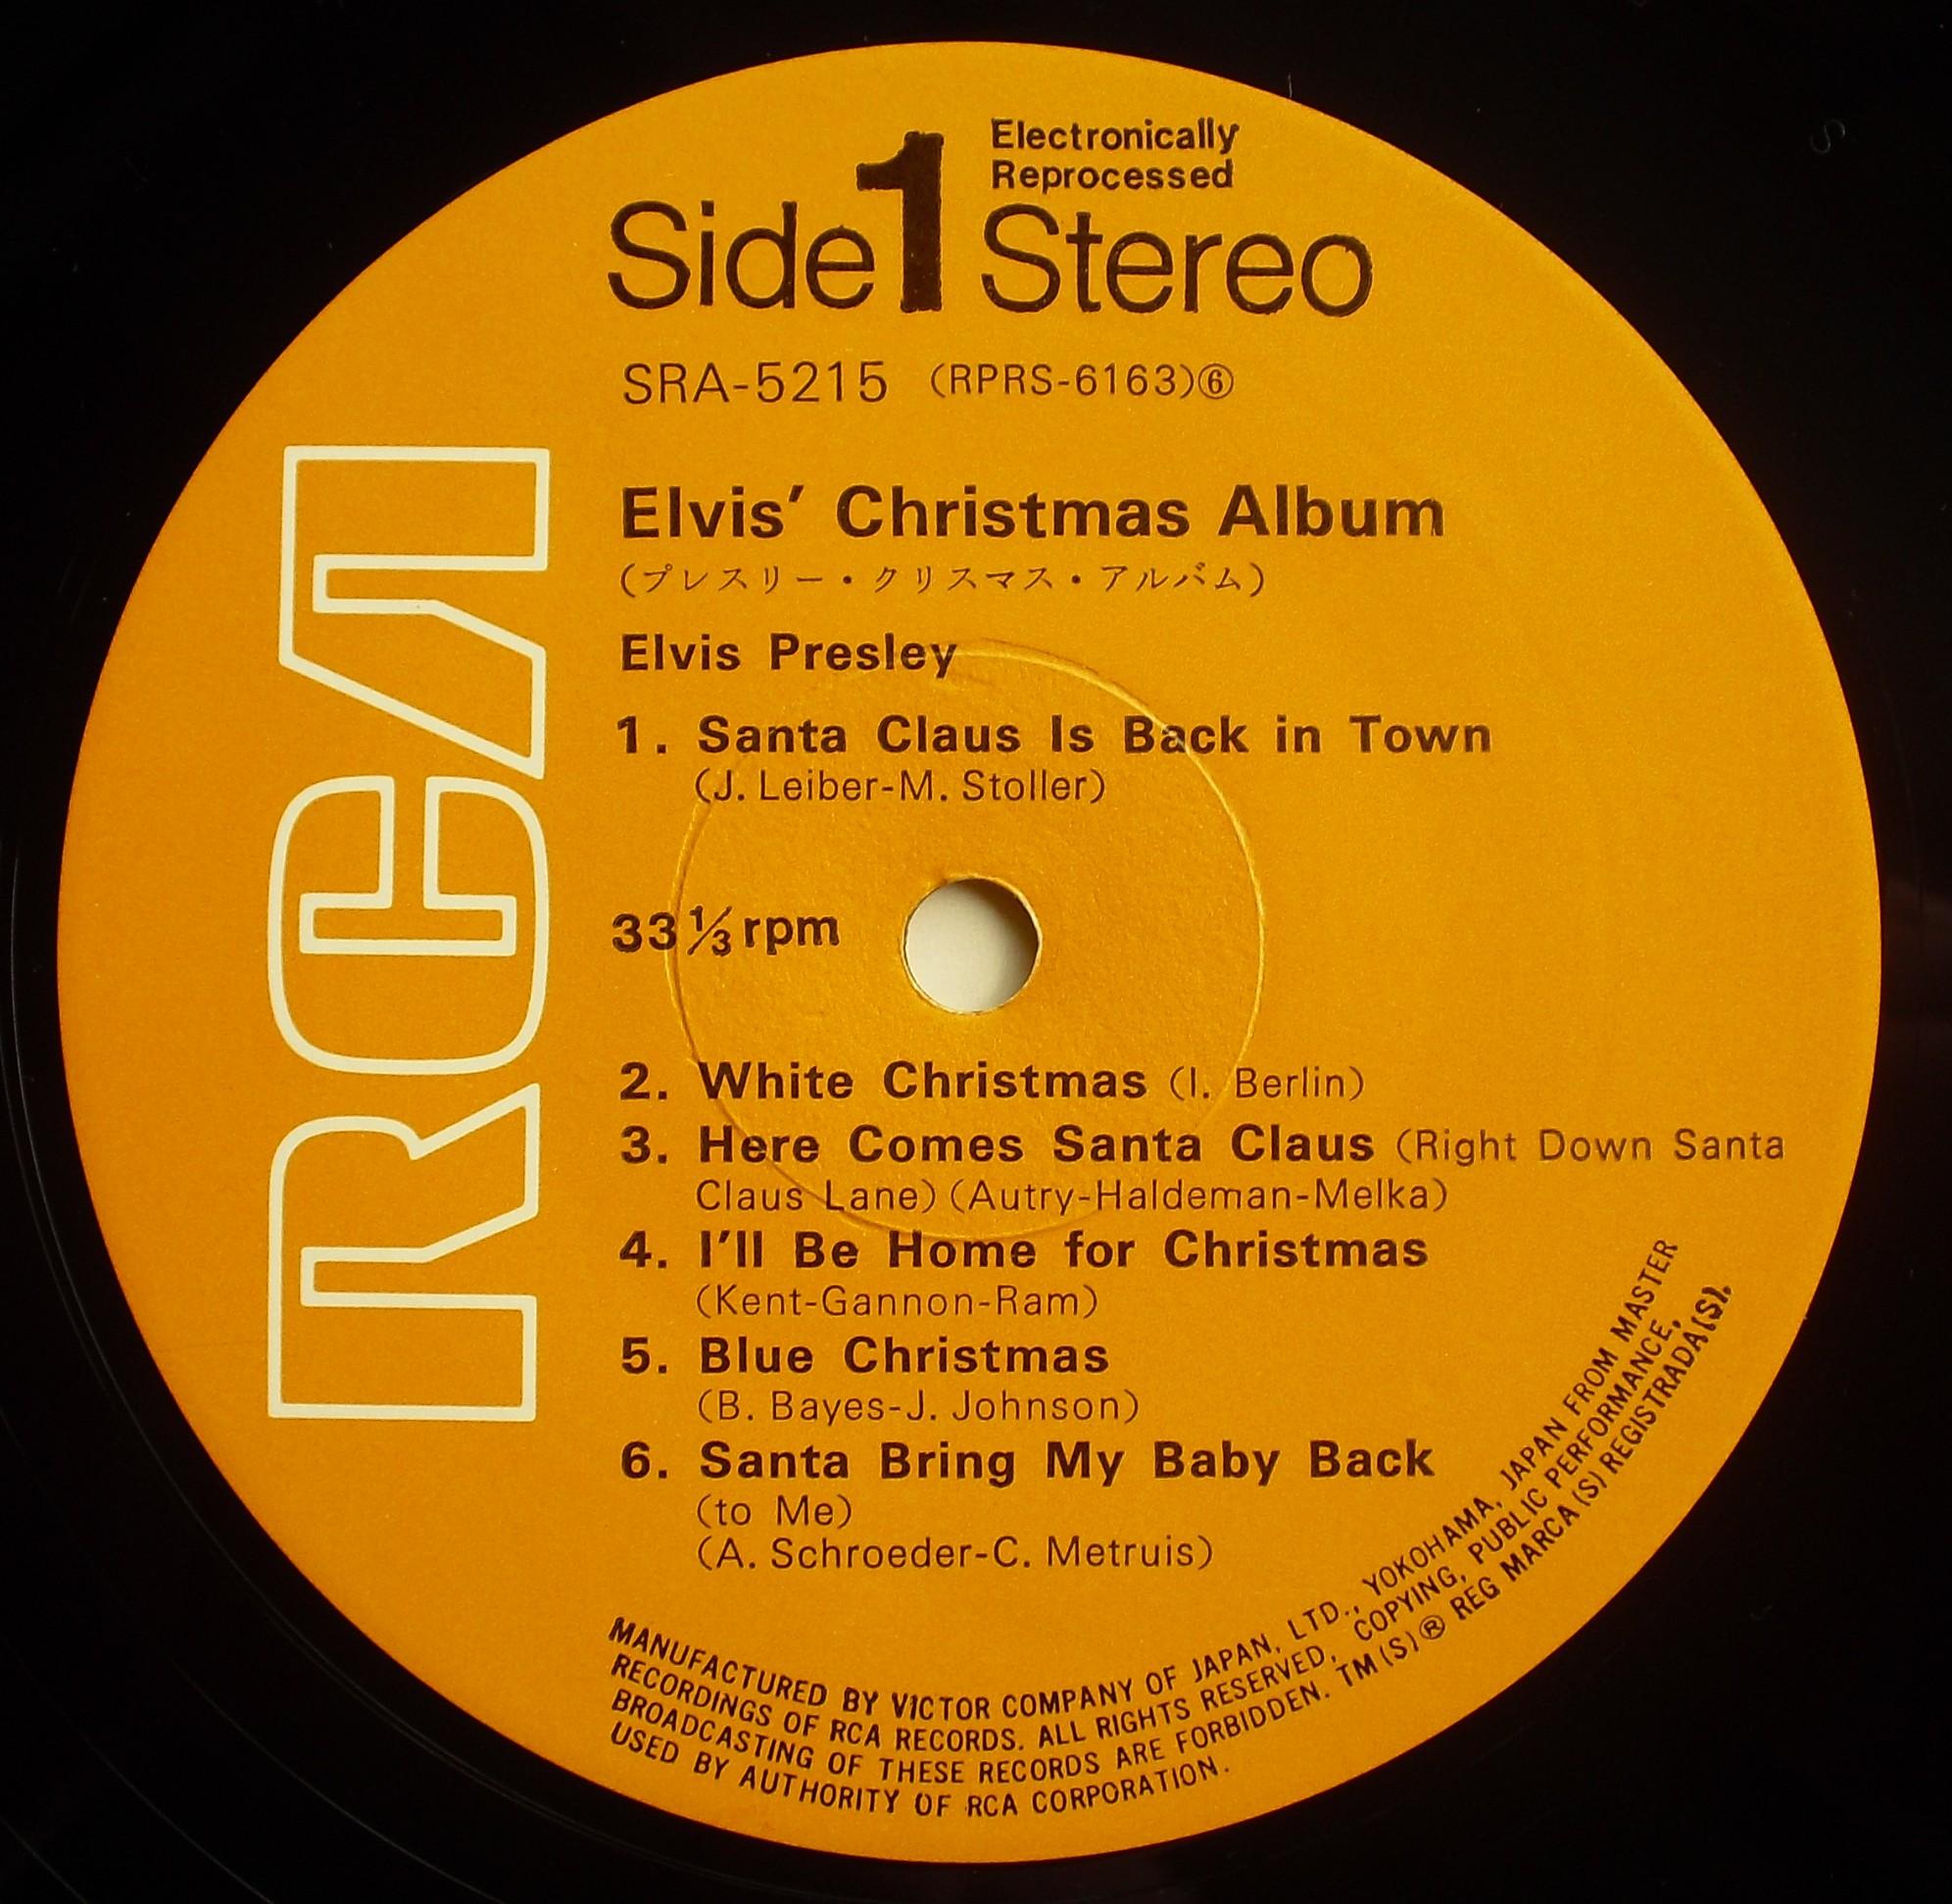 ELVIS' CHRISTMAS ALBUM 05s1mvs4t